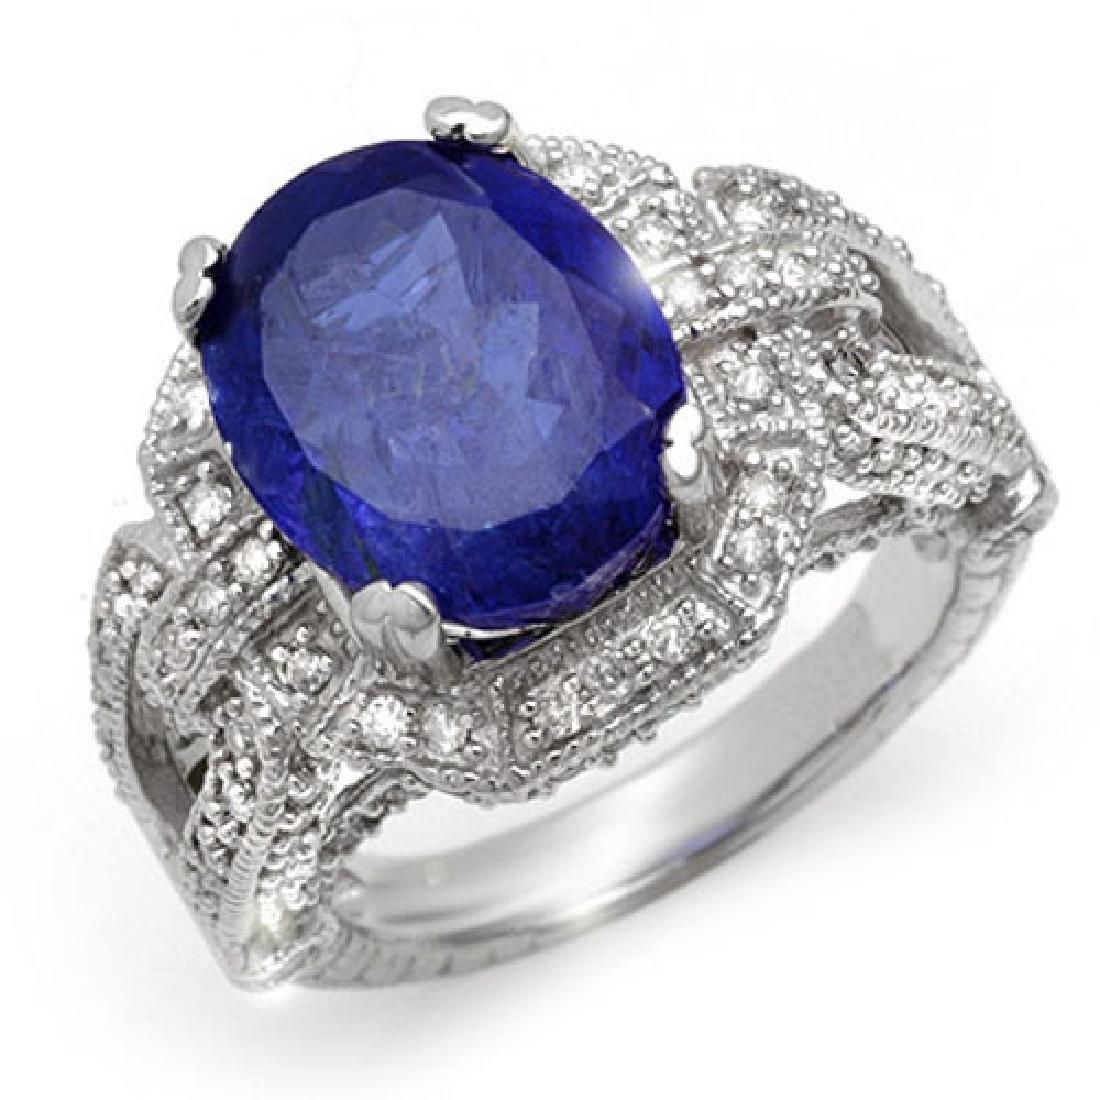 8.50 CTW Tanzanite & Diamond Ring 14K White Gold